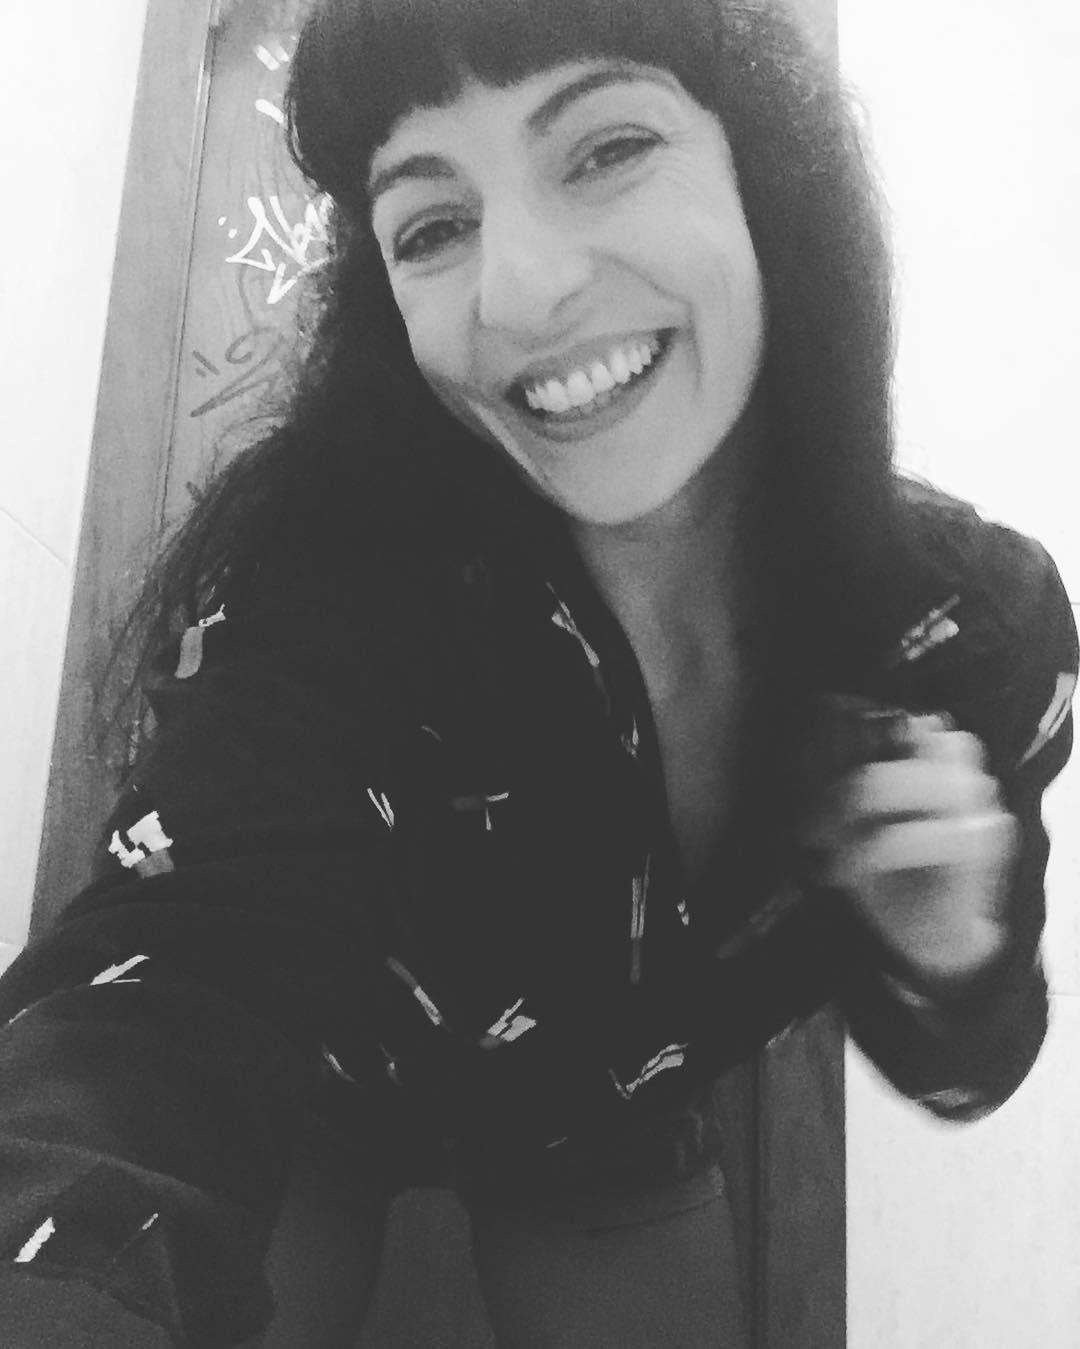 Hola, soy Dora la exploradora #amillspublicwc ;))